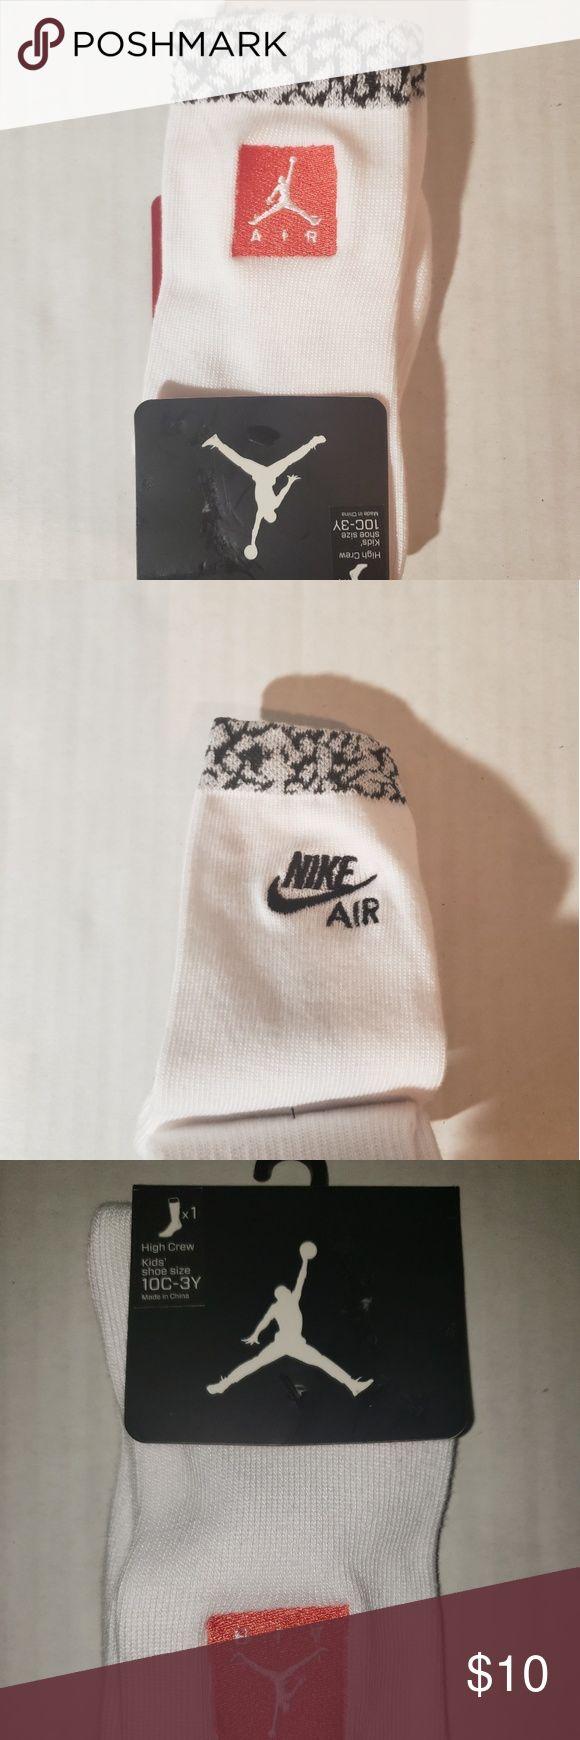 NWT Boy's Jordan socks Brand New. Never been worn size 10 C- 3y Jordan Acces…